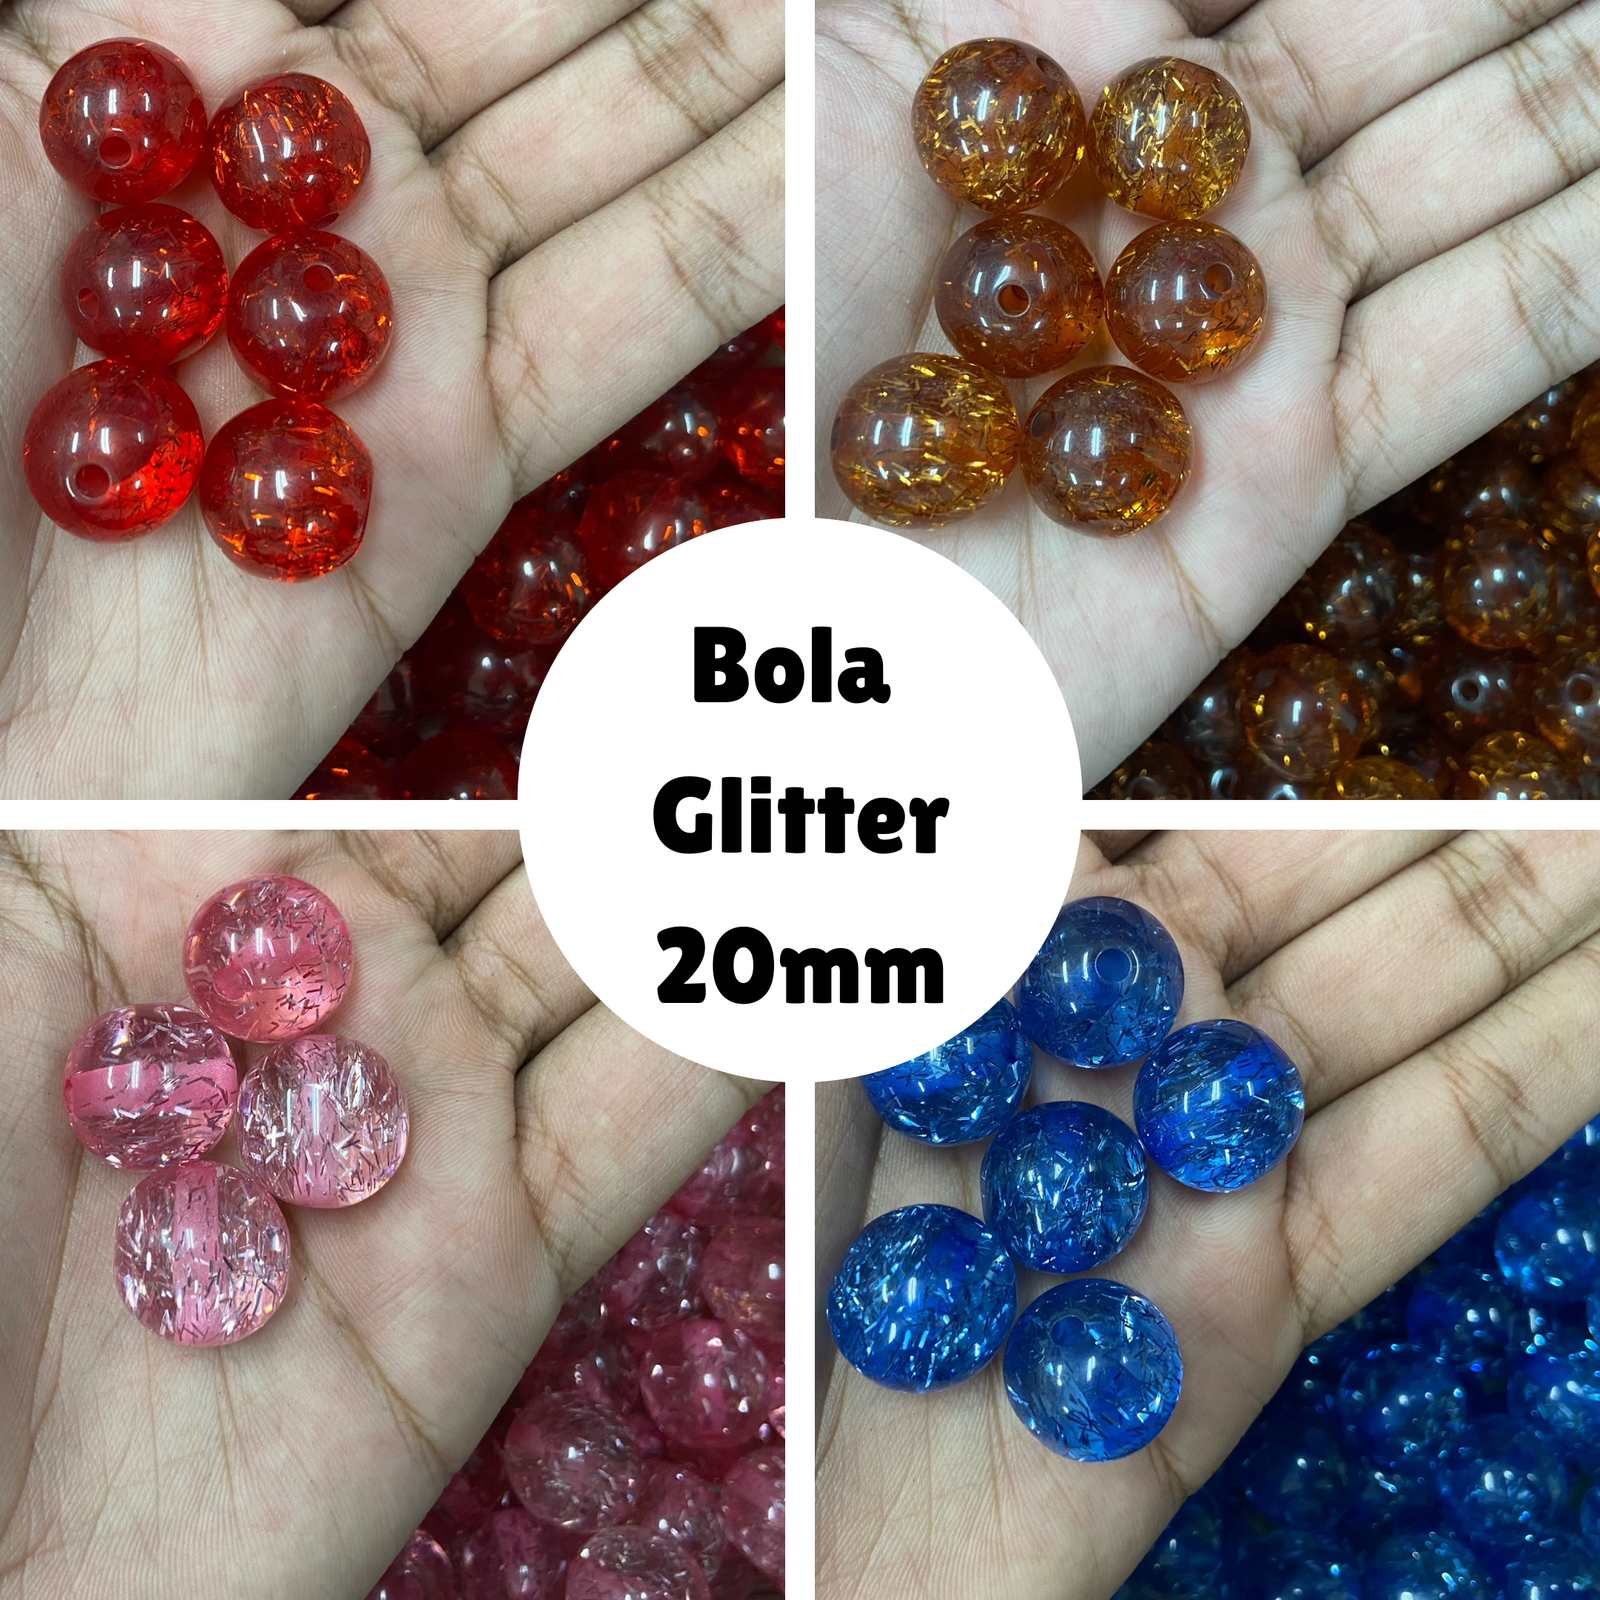 Bola Glitter 20mm - 500g